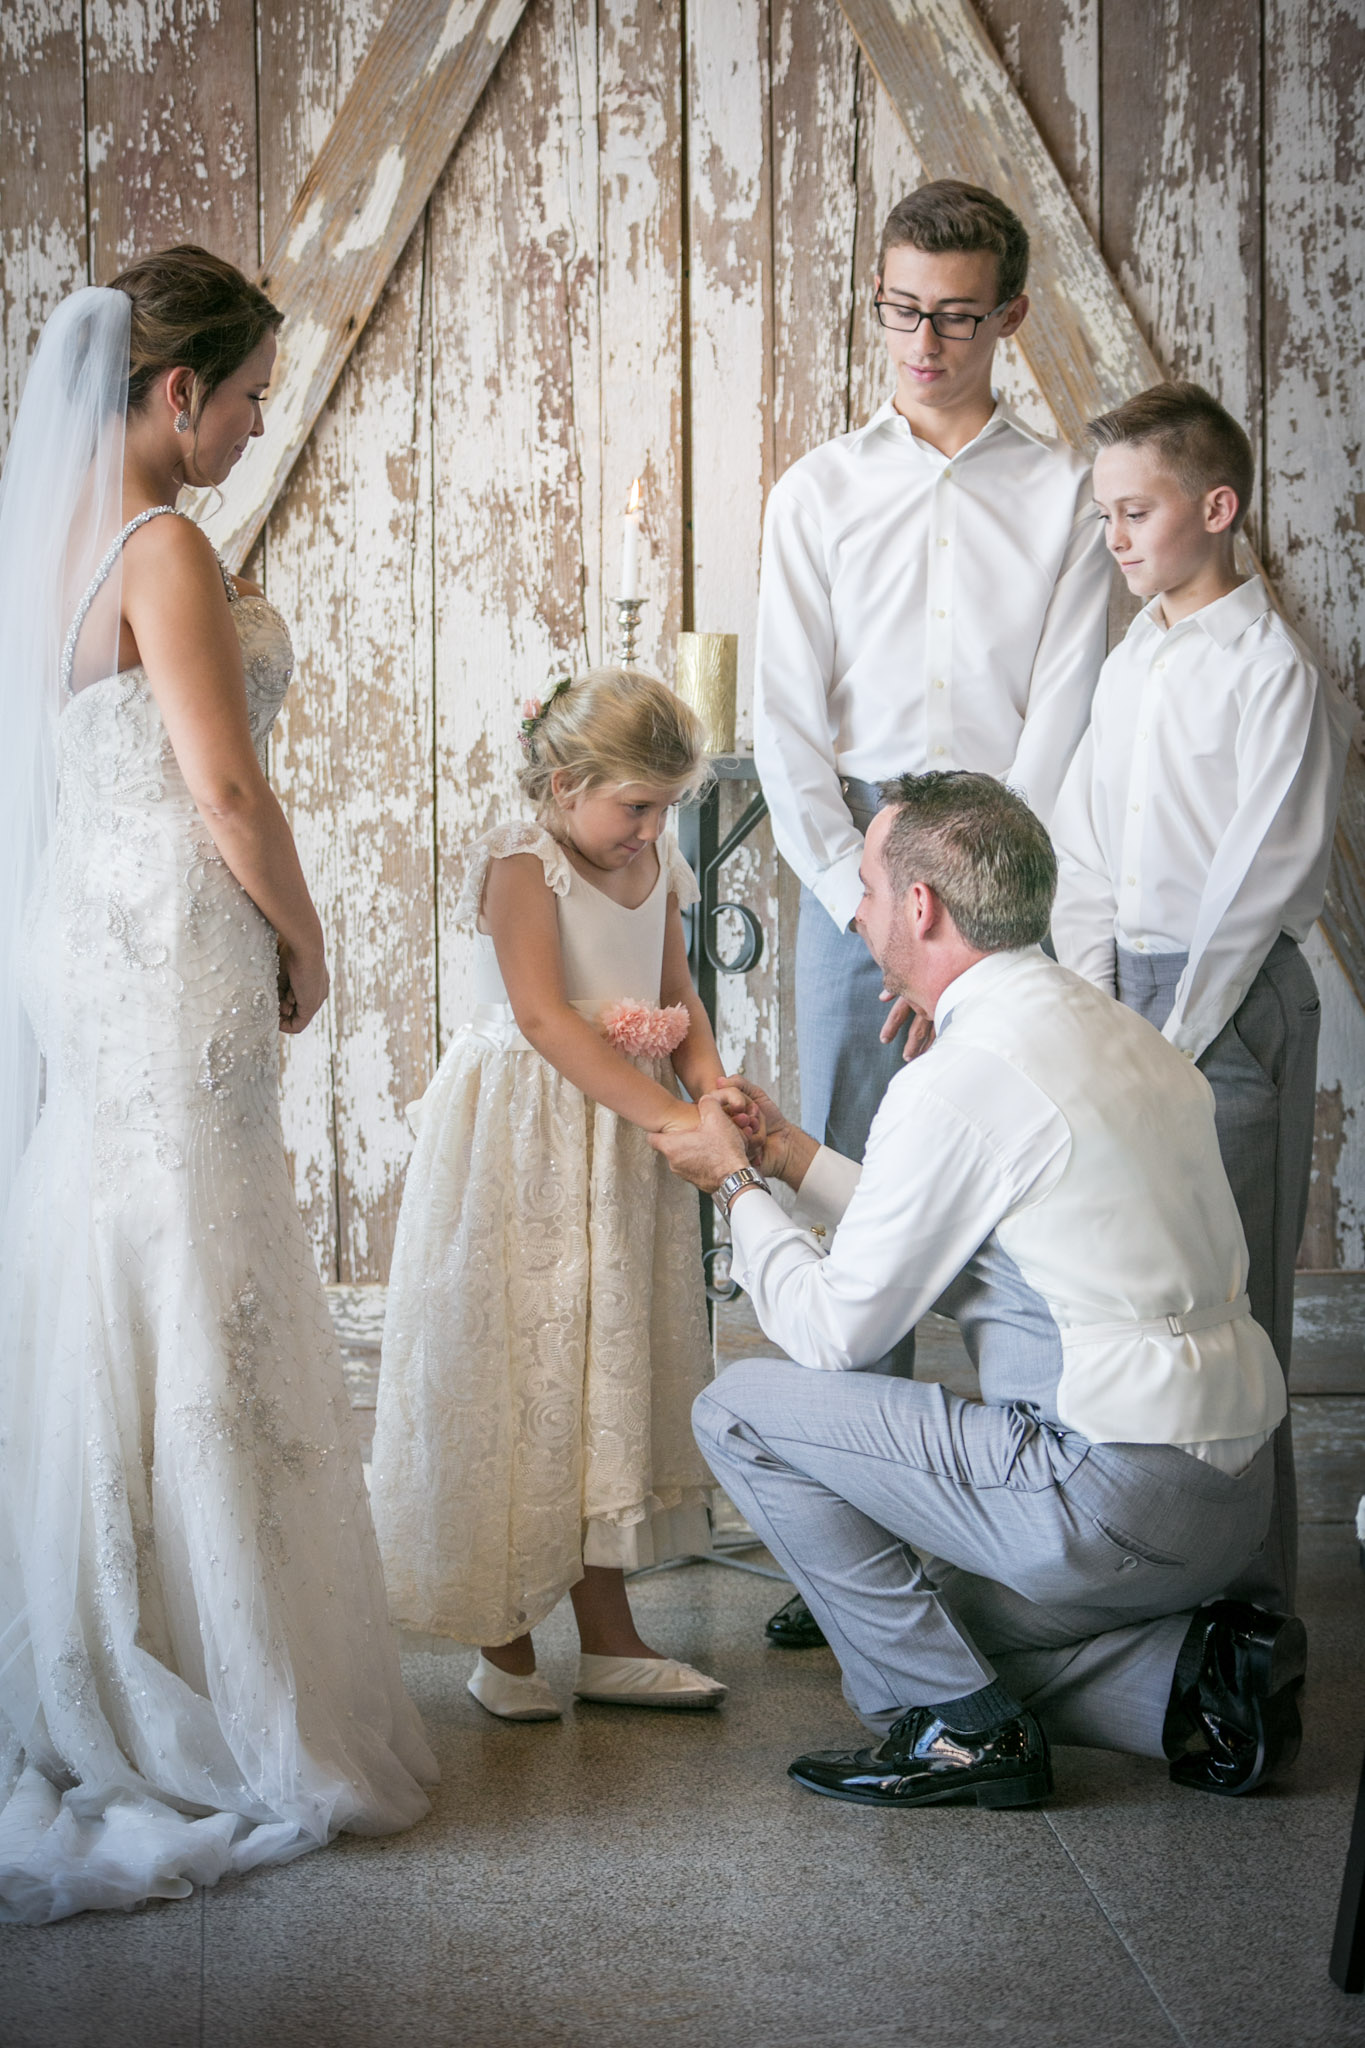 The_Vow_Exchange_Kansas_City_Small_Budget_Wedding_Venue_Ceremony_Ideas_Mindi&Craig_093.jpg